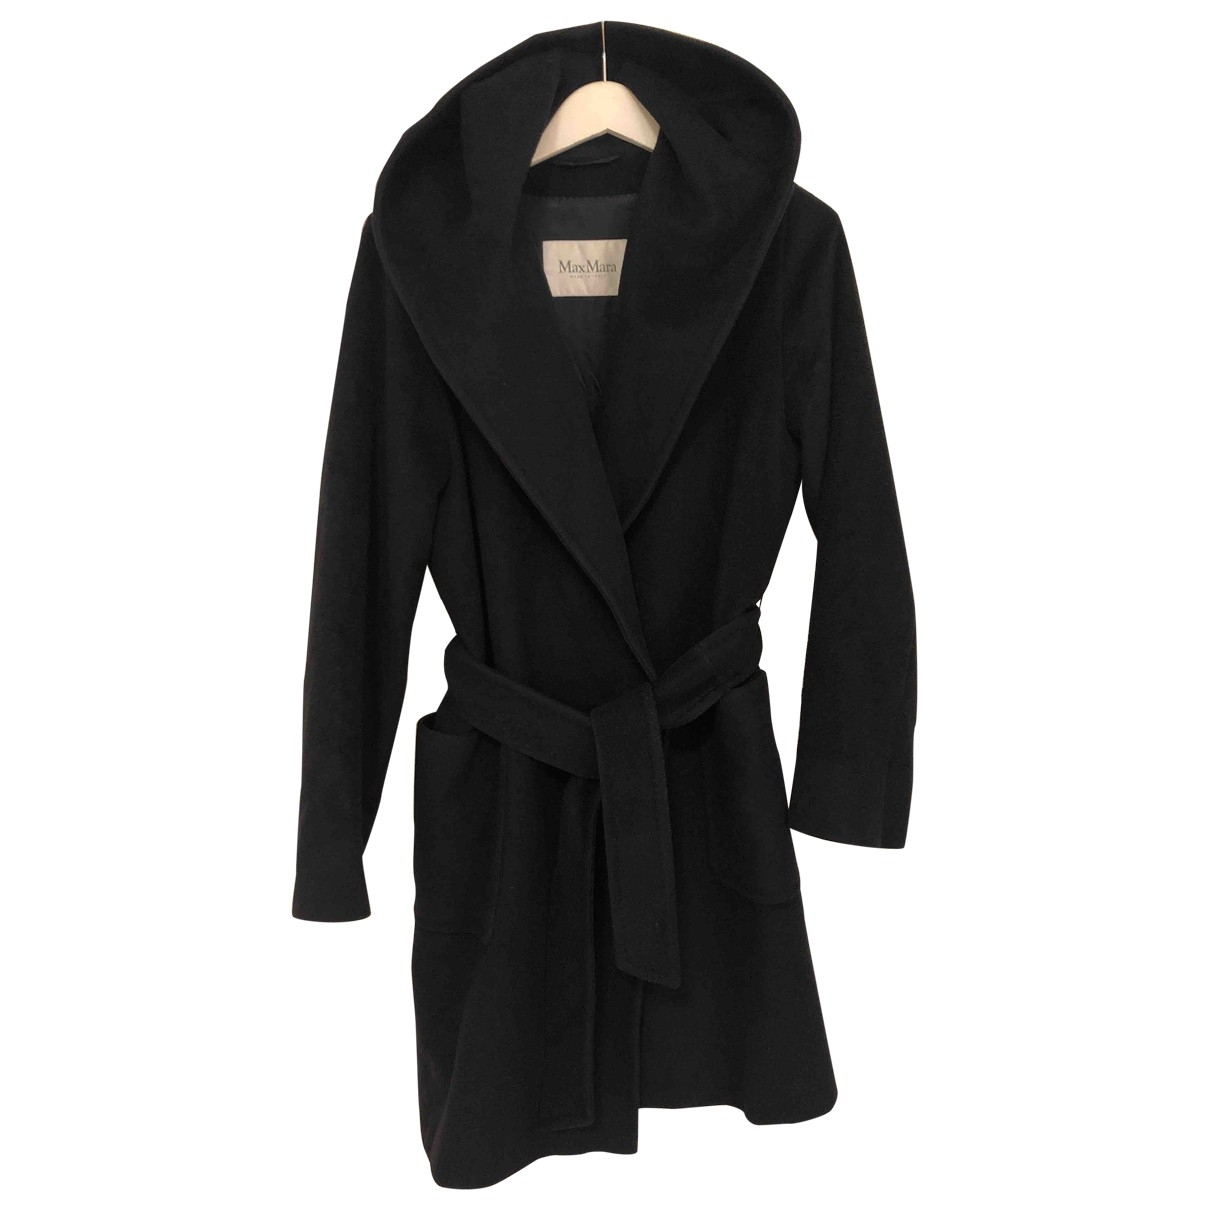 Max Mara \N Navy Wool coat for Women 42 FR